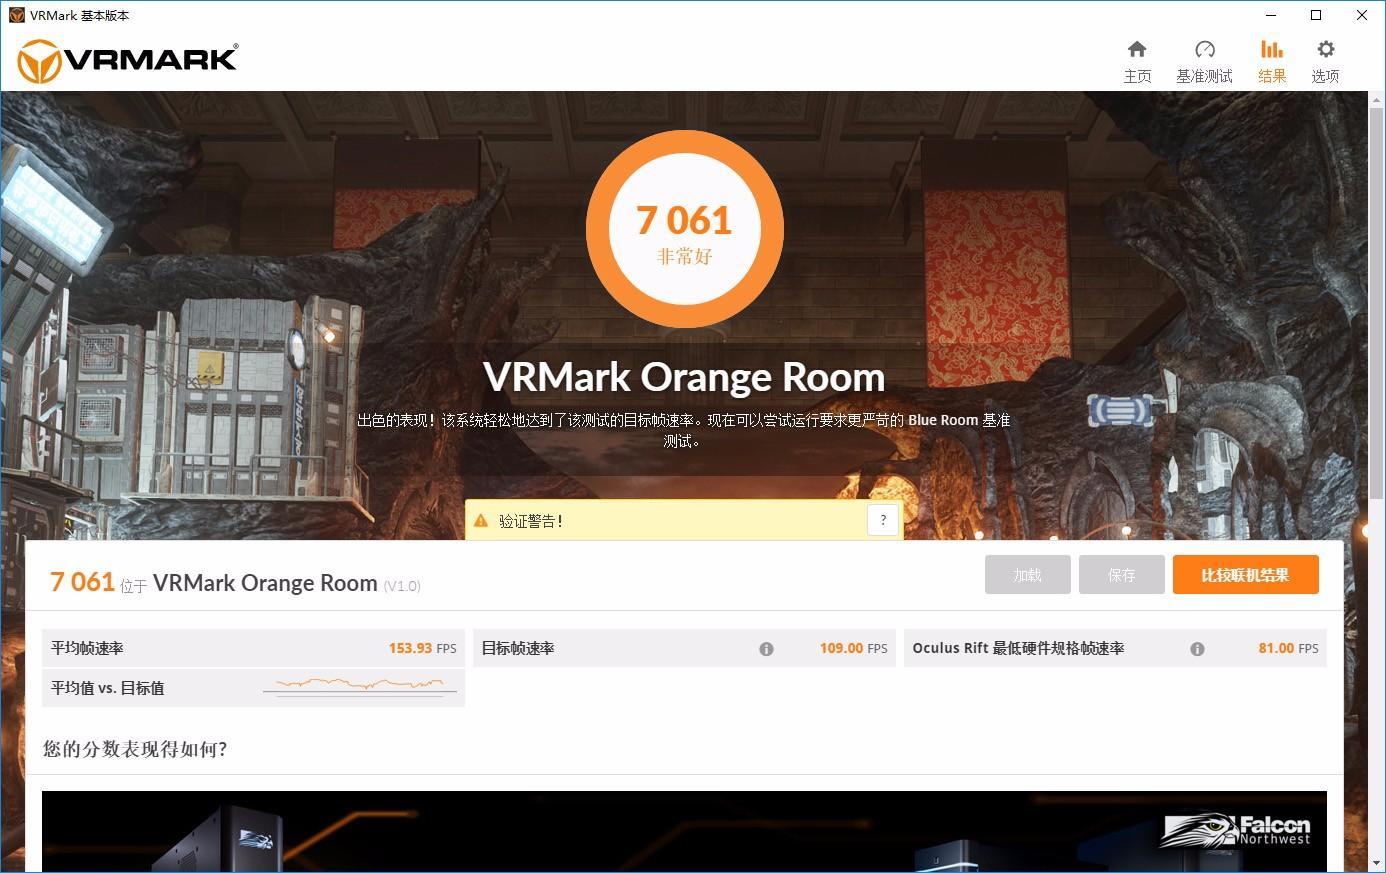 intel-core-i7-7700k_5-ghz_vrmark-orange-room